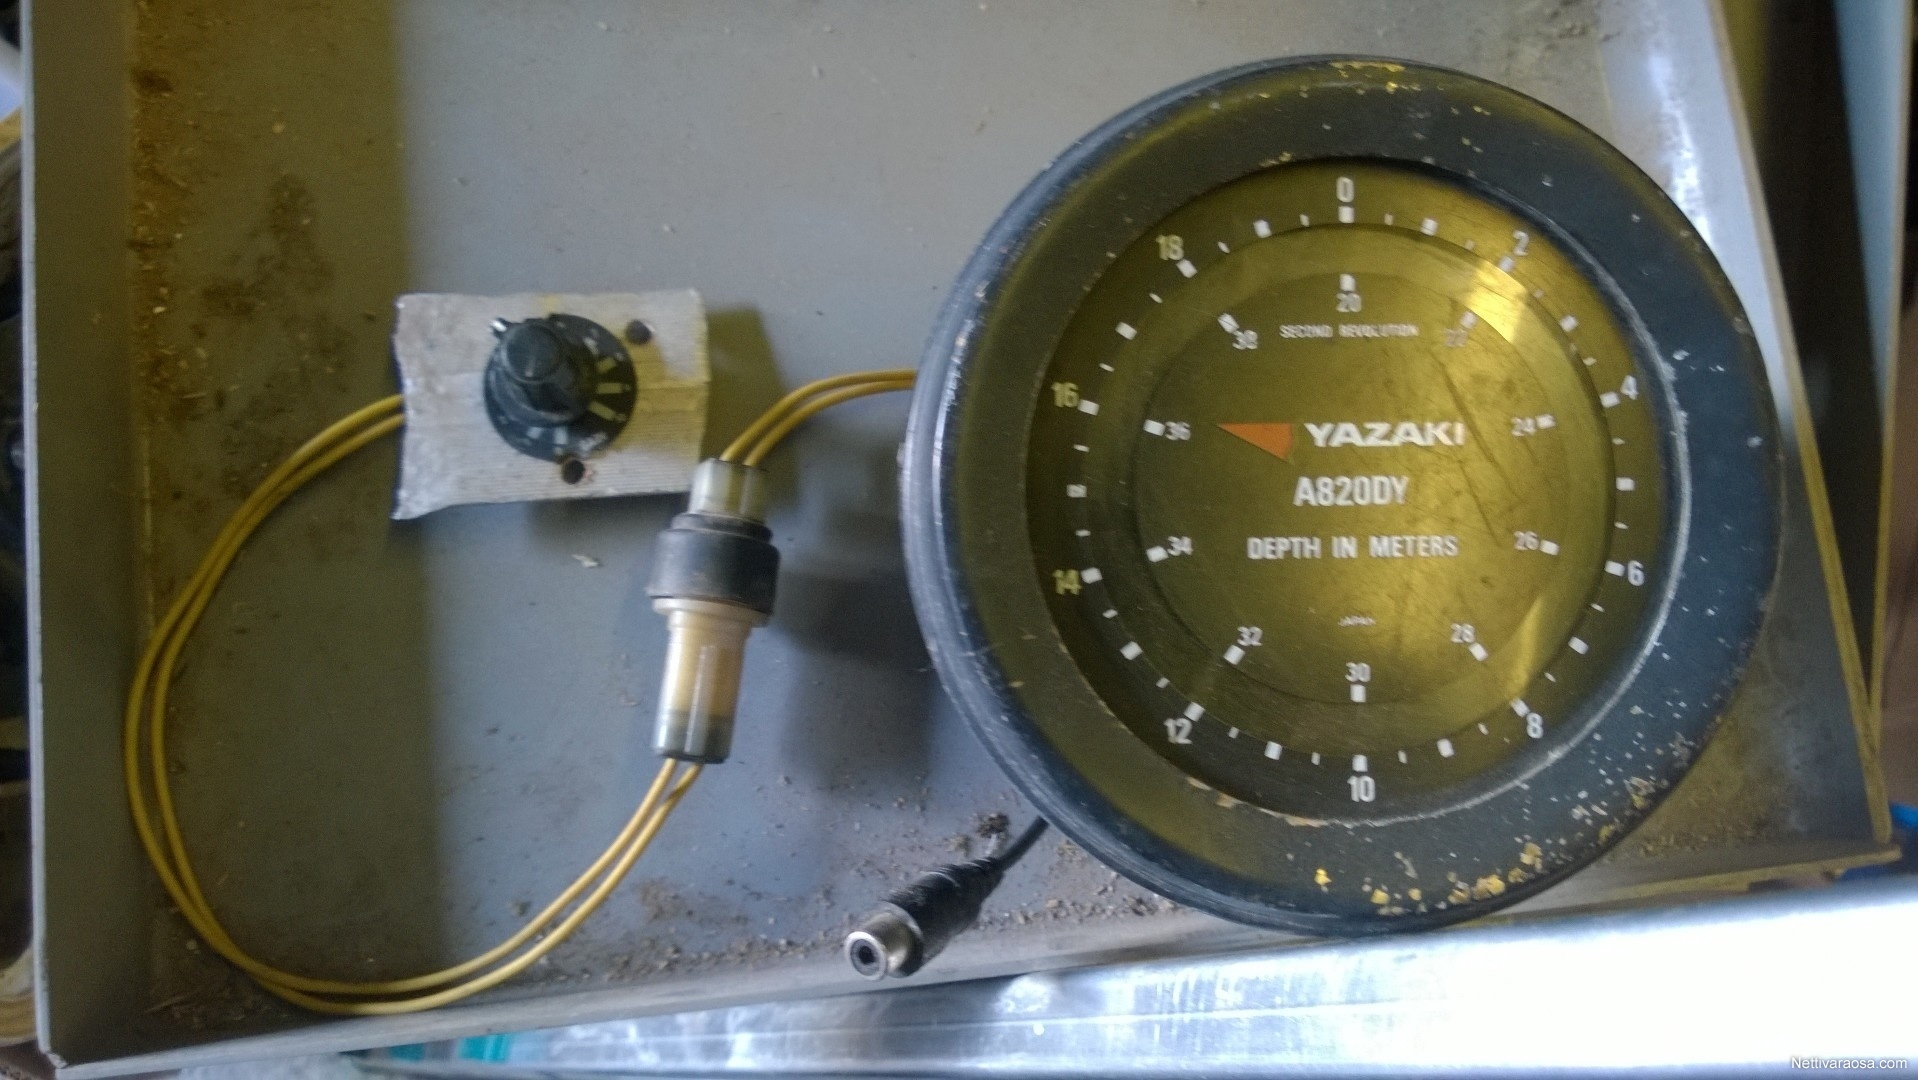 Wiring Tachometer Yazaki Trusted Diagrams Faze Tach Nettivaraosa Mittari Boat Accessories And Parts Diagram